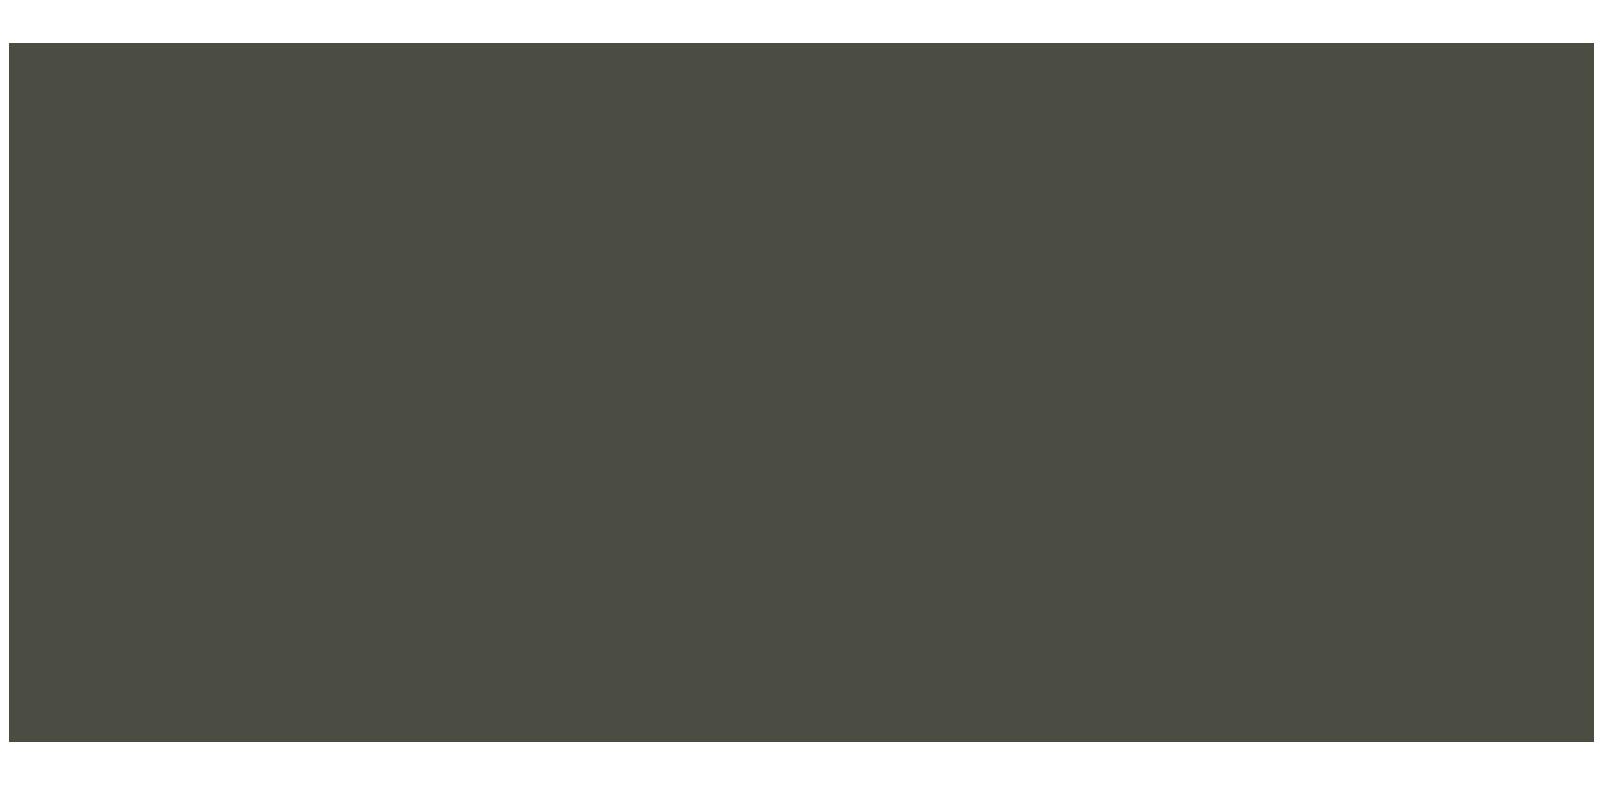 Photofilm Badge